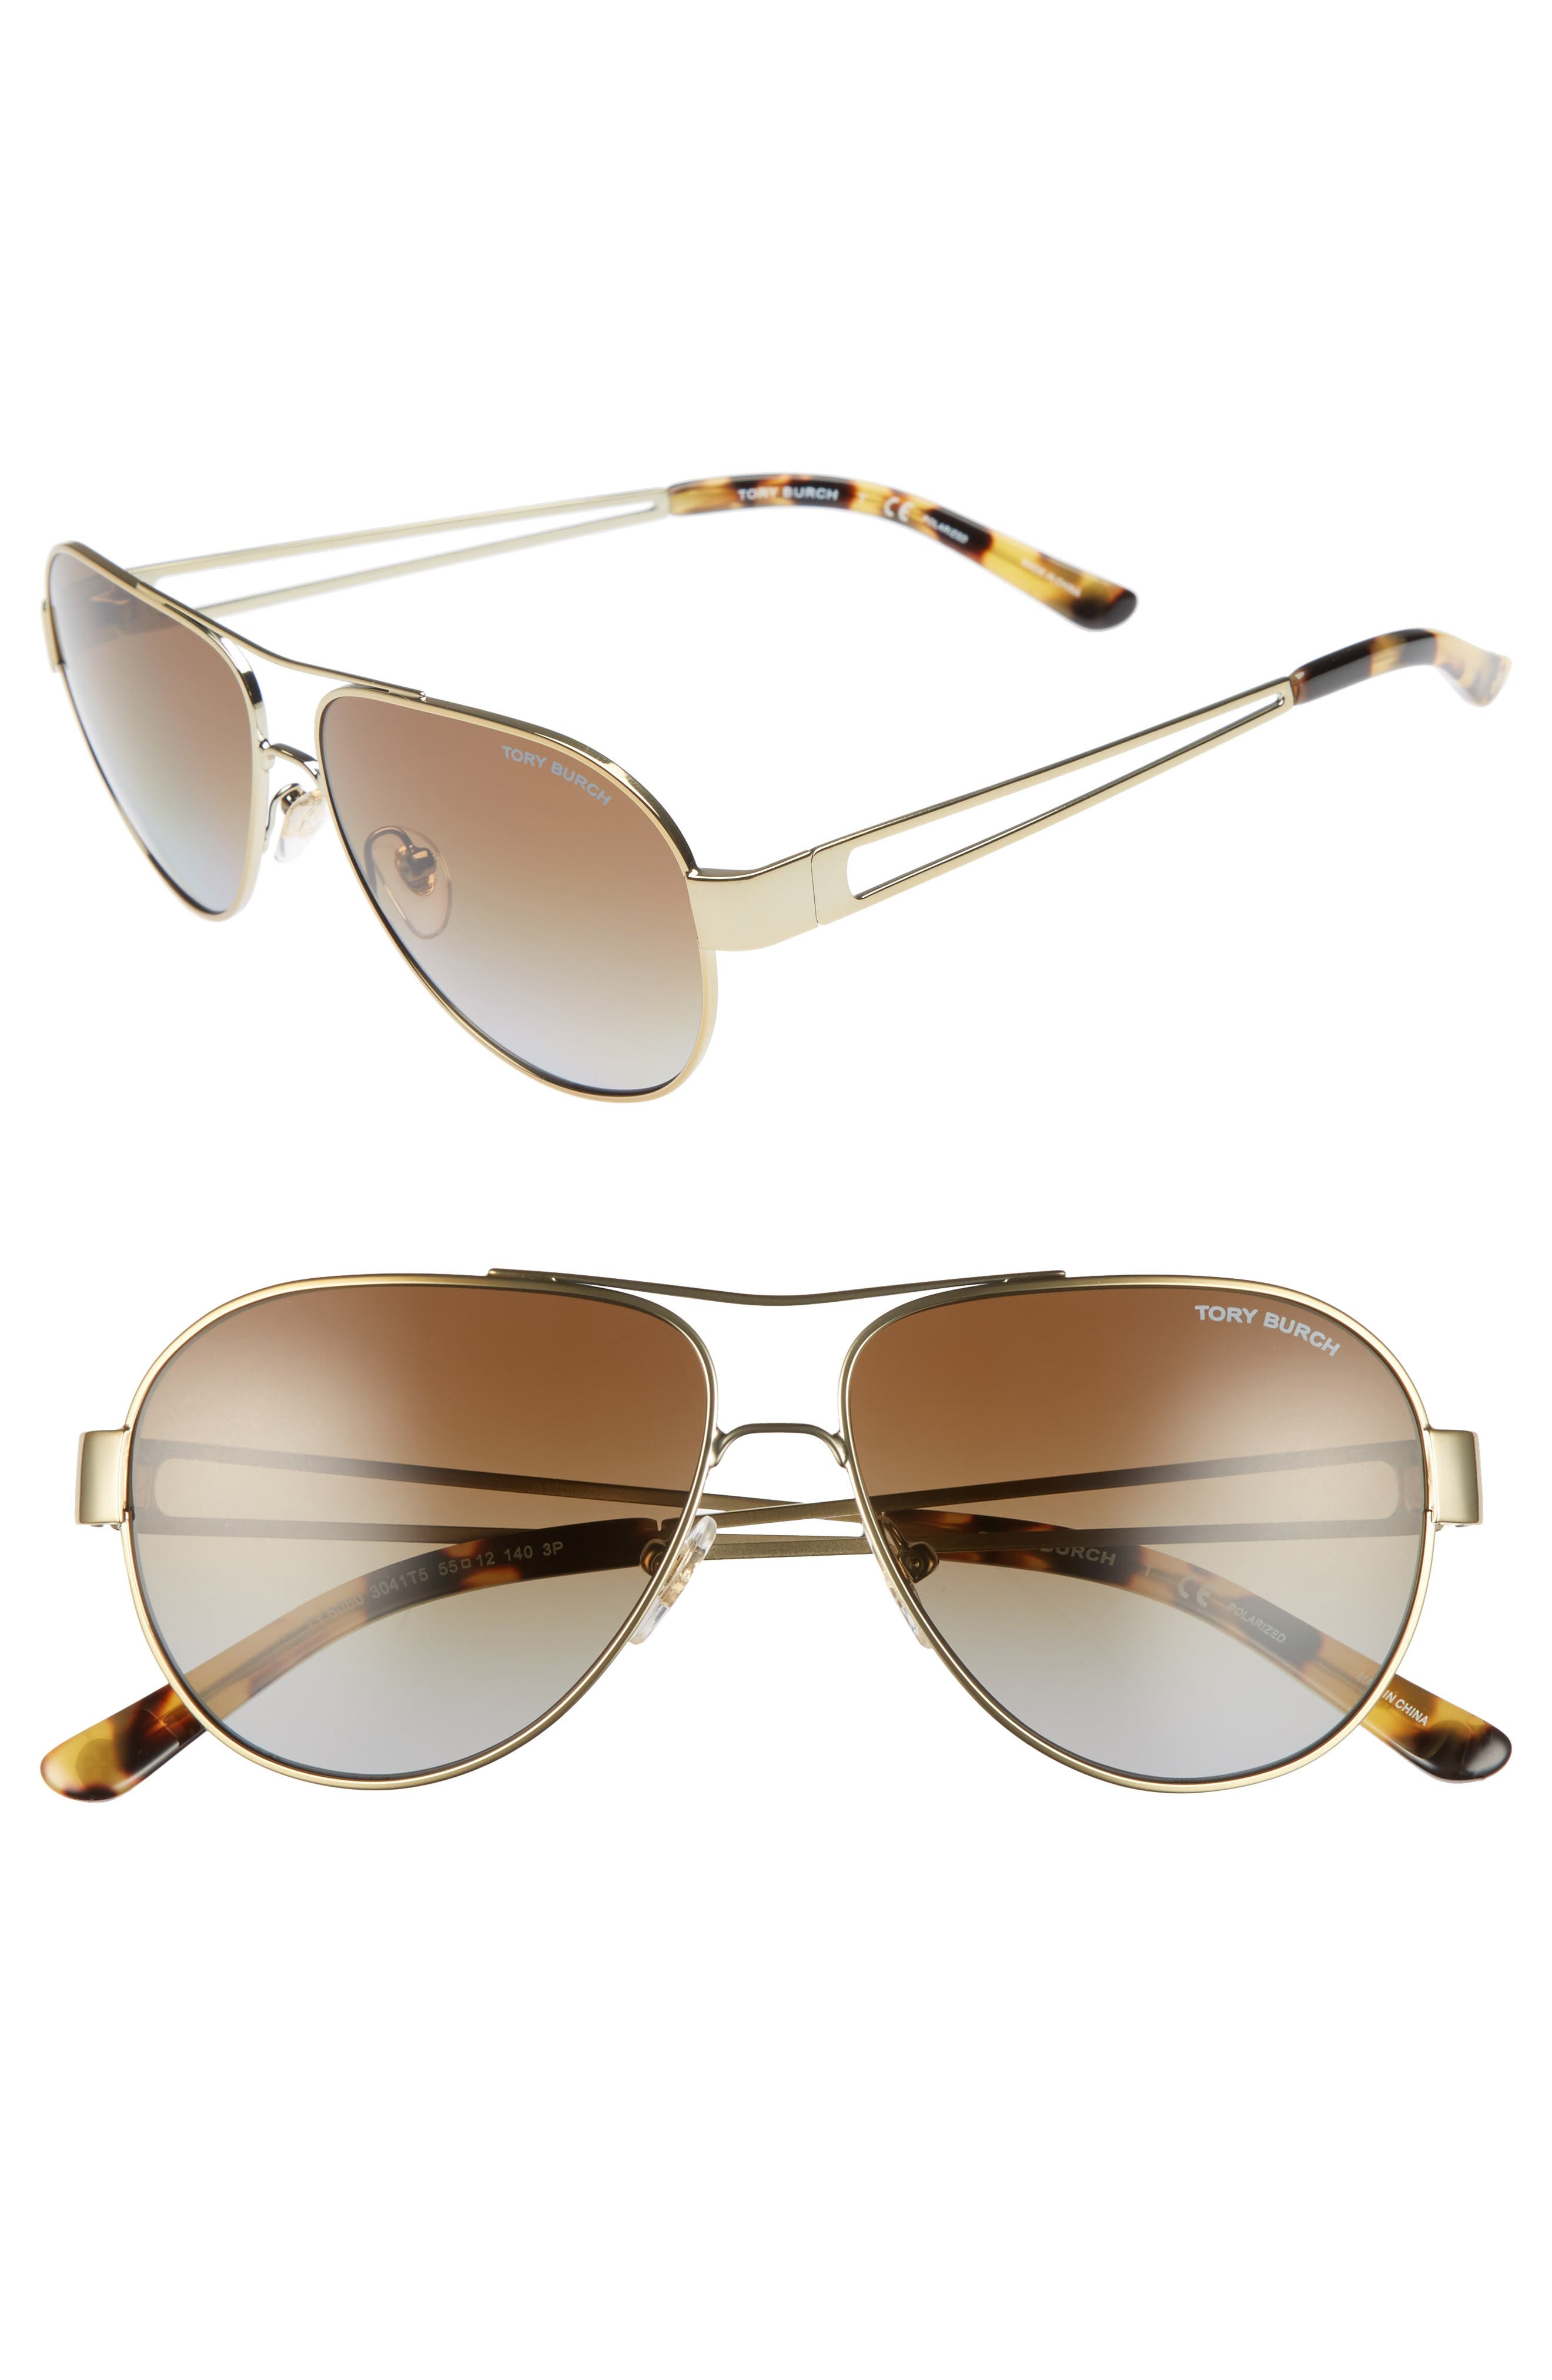 55mm Polarized Aviator Sunglasses,                             Main thumbnail 5, color,